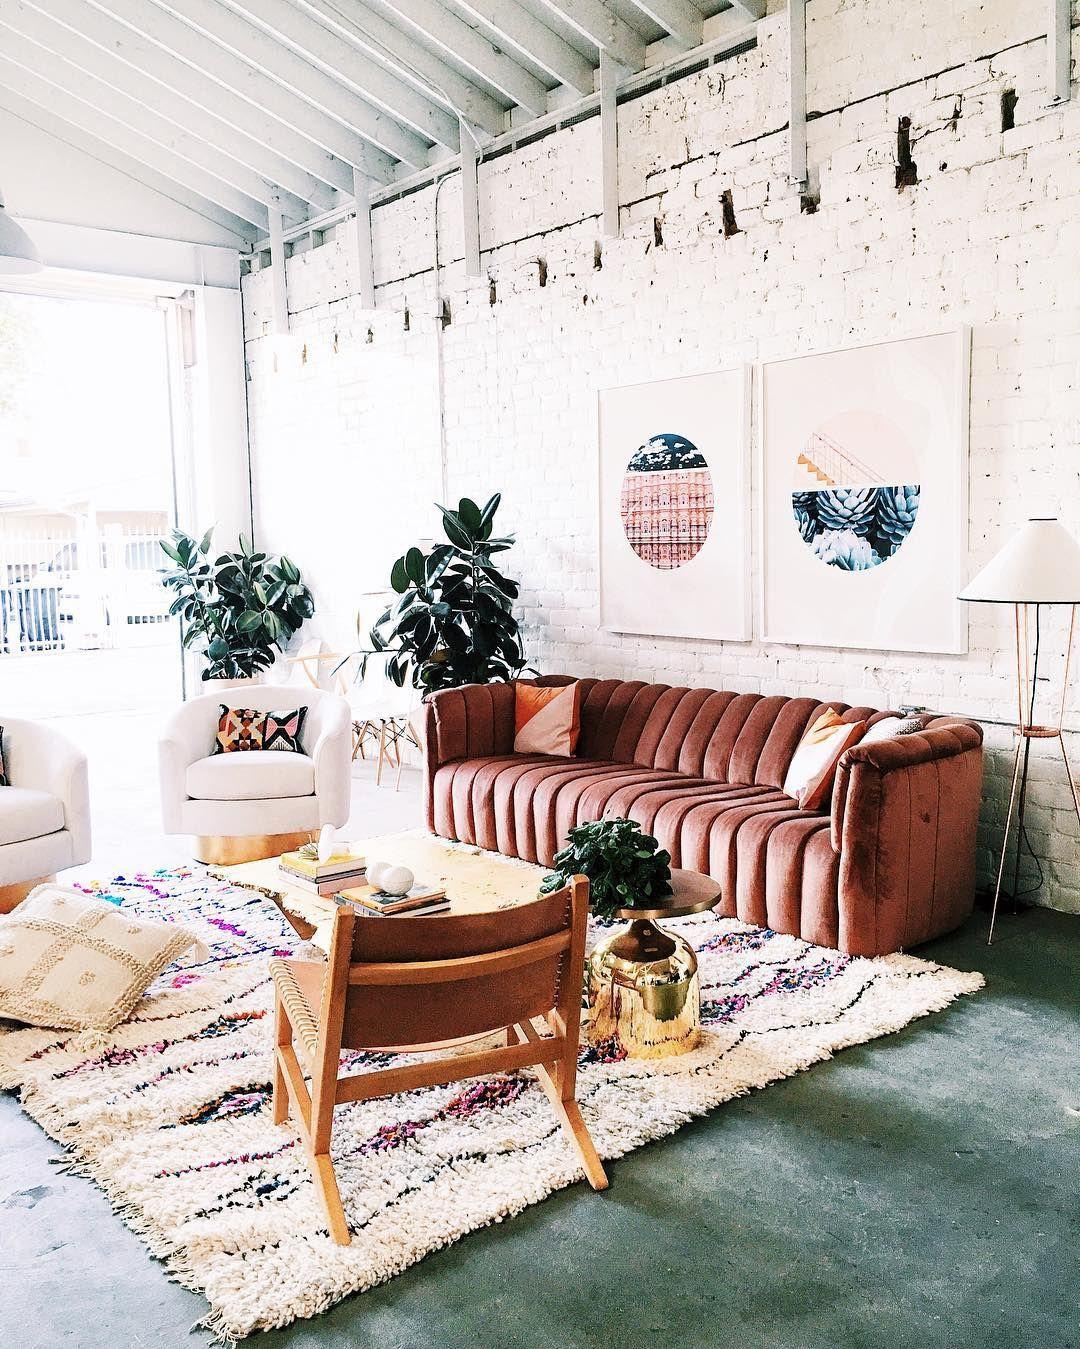 Bohemian Decorating Ideas For Small Studio: @lightlab Studio Space